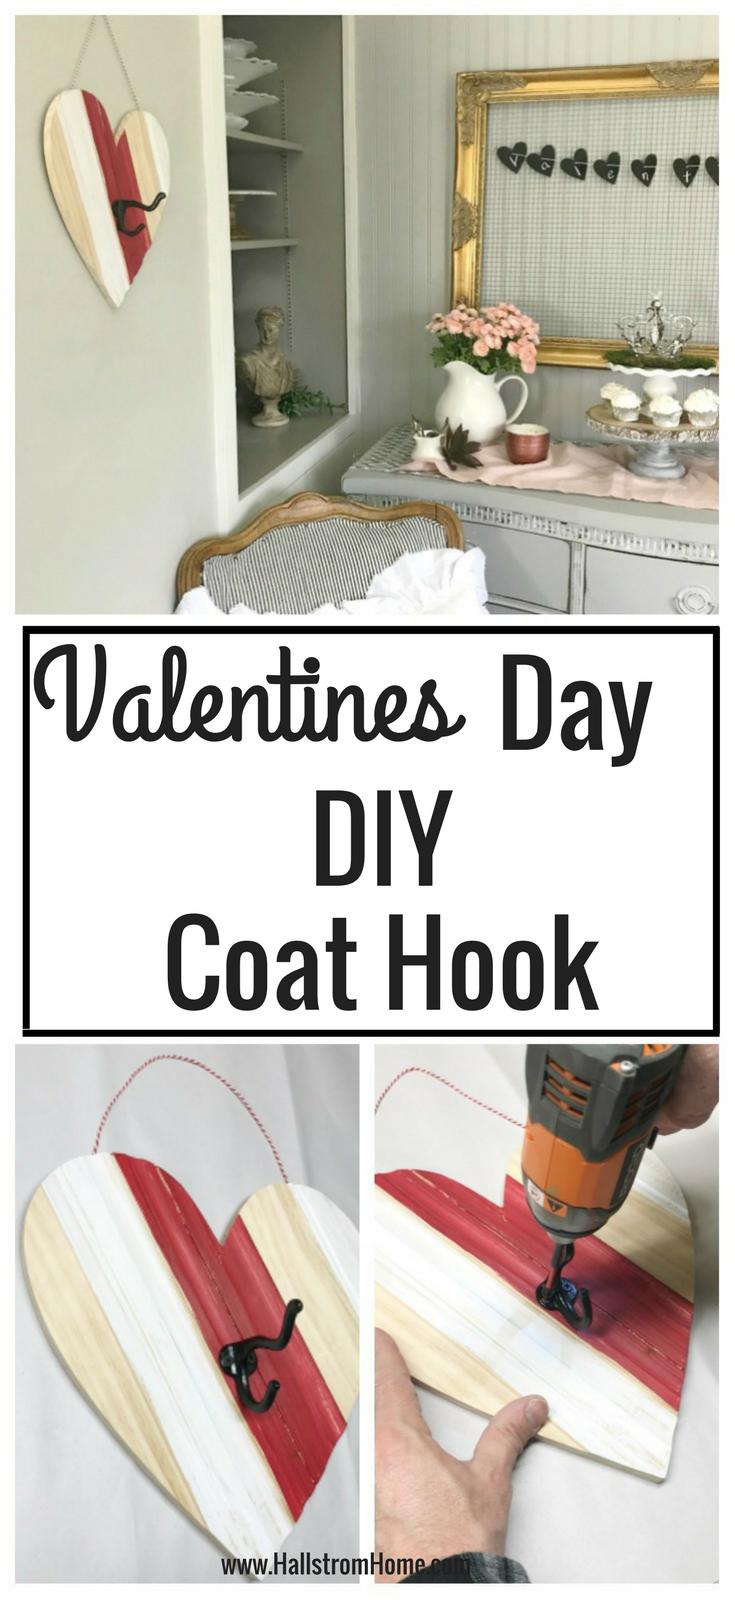 Pinterest image Valentines day diy coat hook. top image coat hook on wall bottom 2 nailing hook on heart